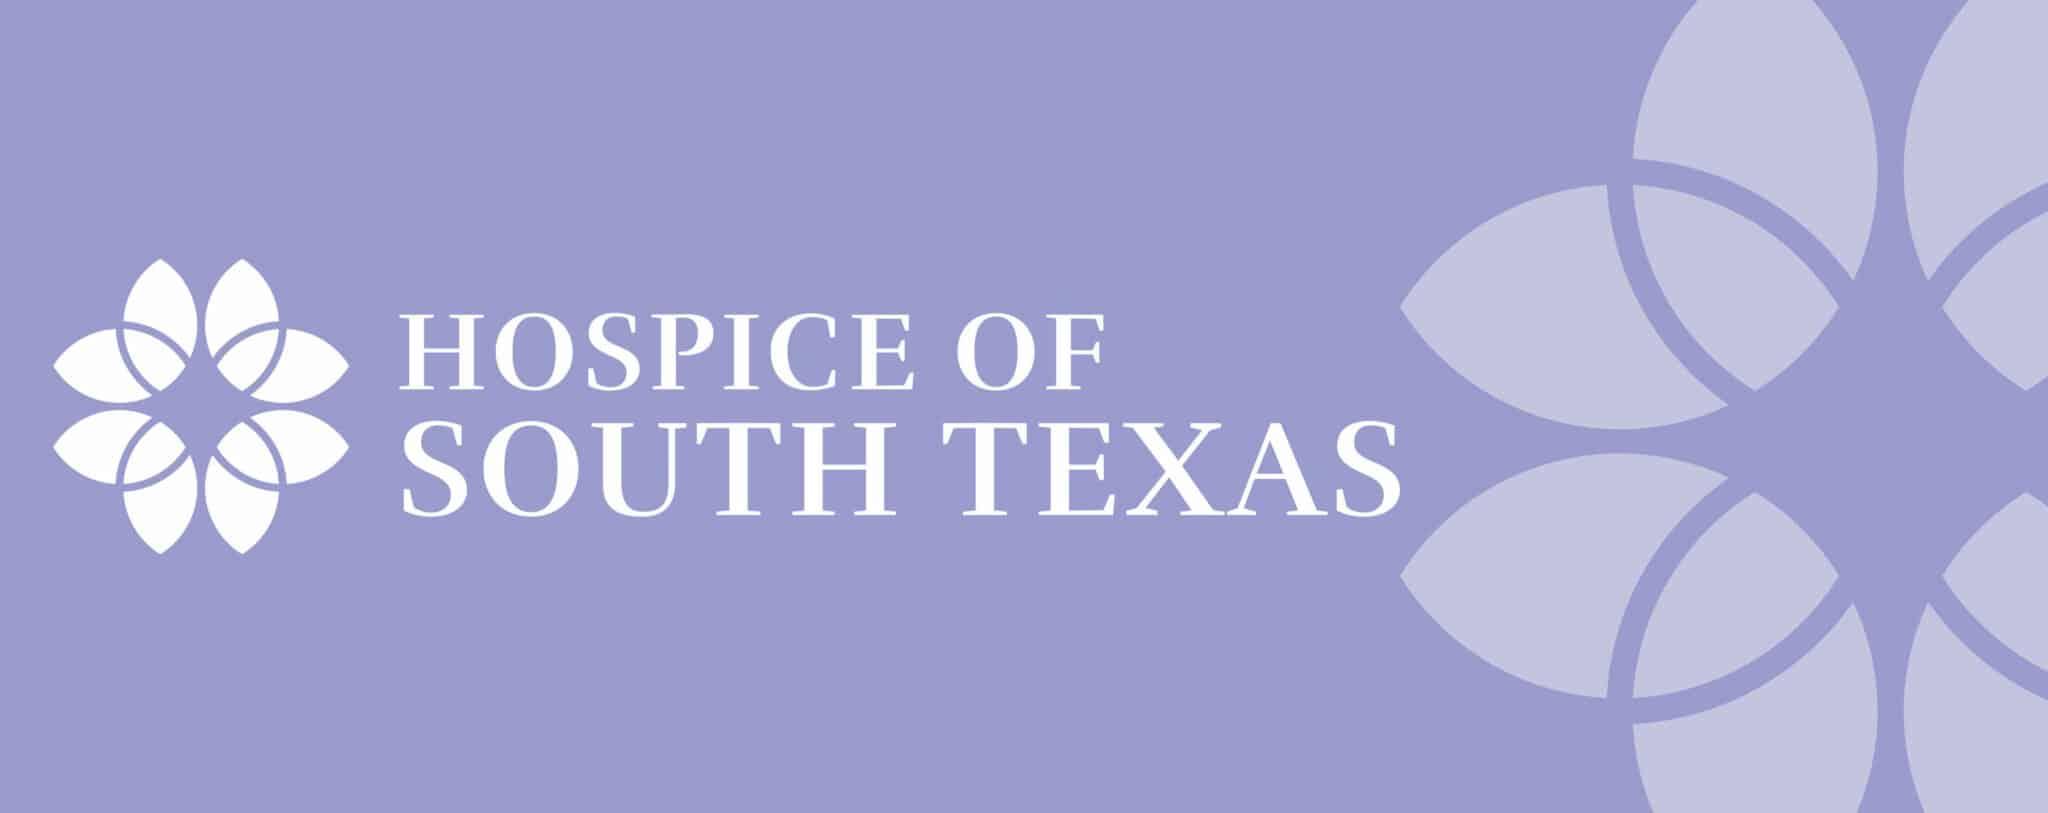 Hospice of South Texas New Logo Victoria, TX